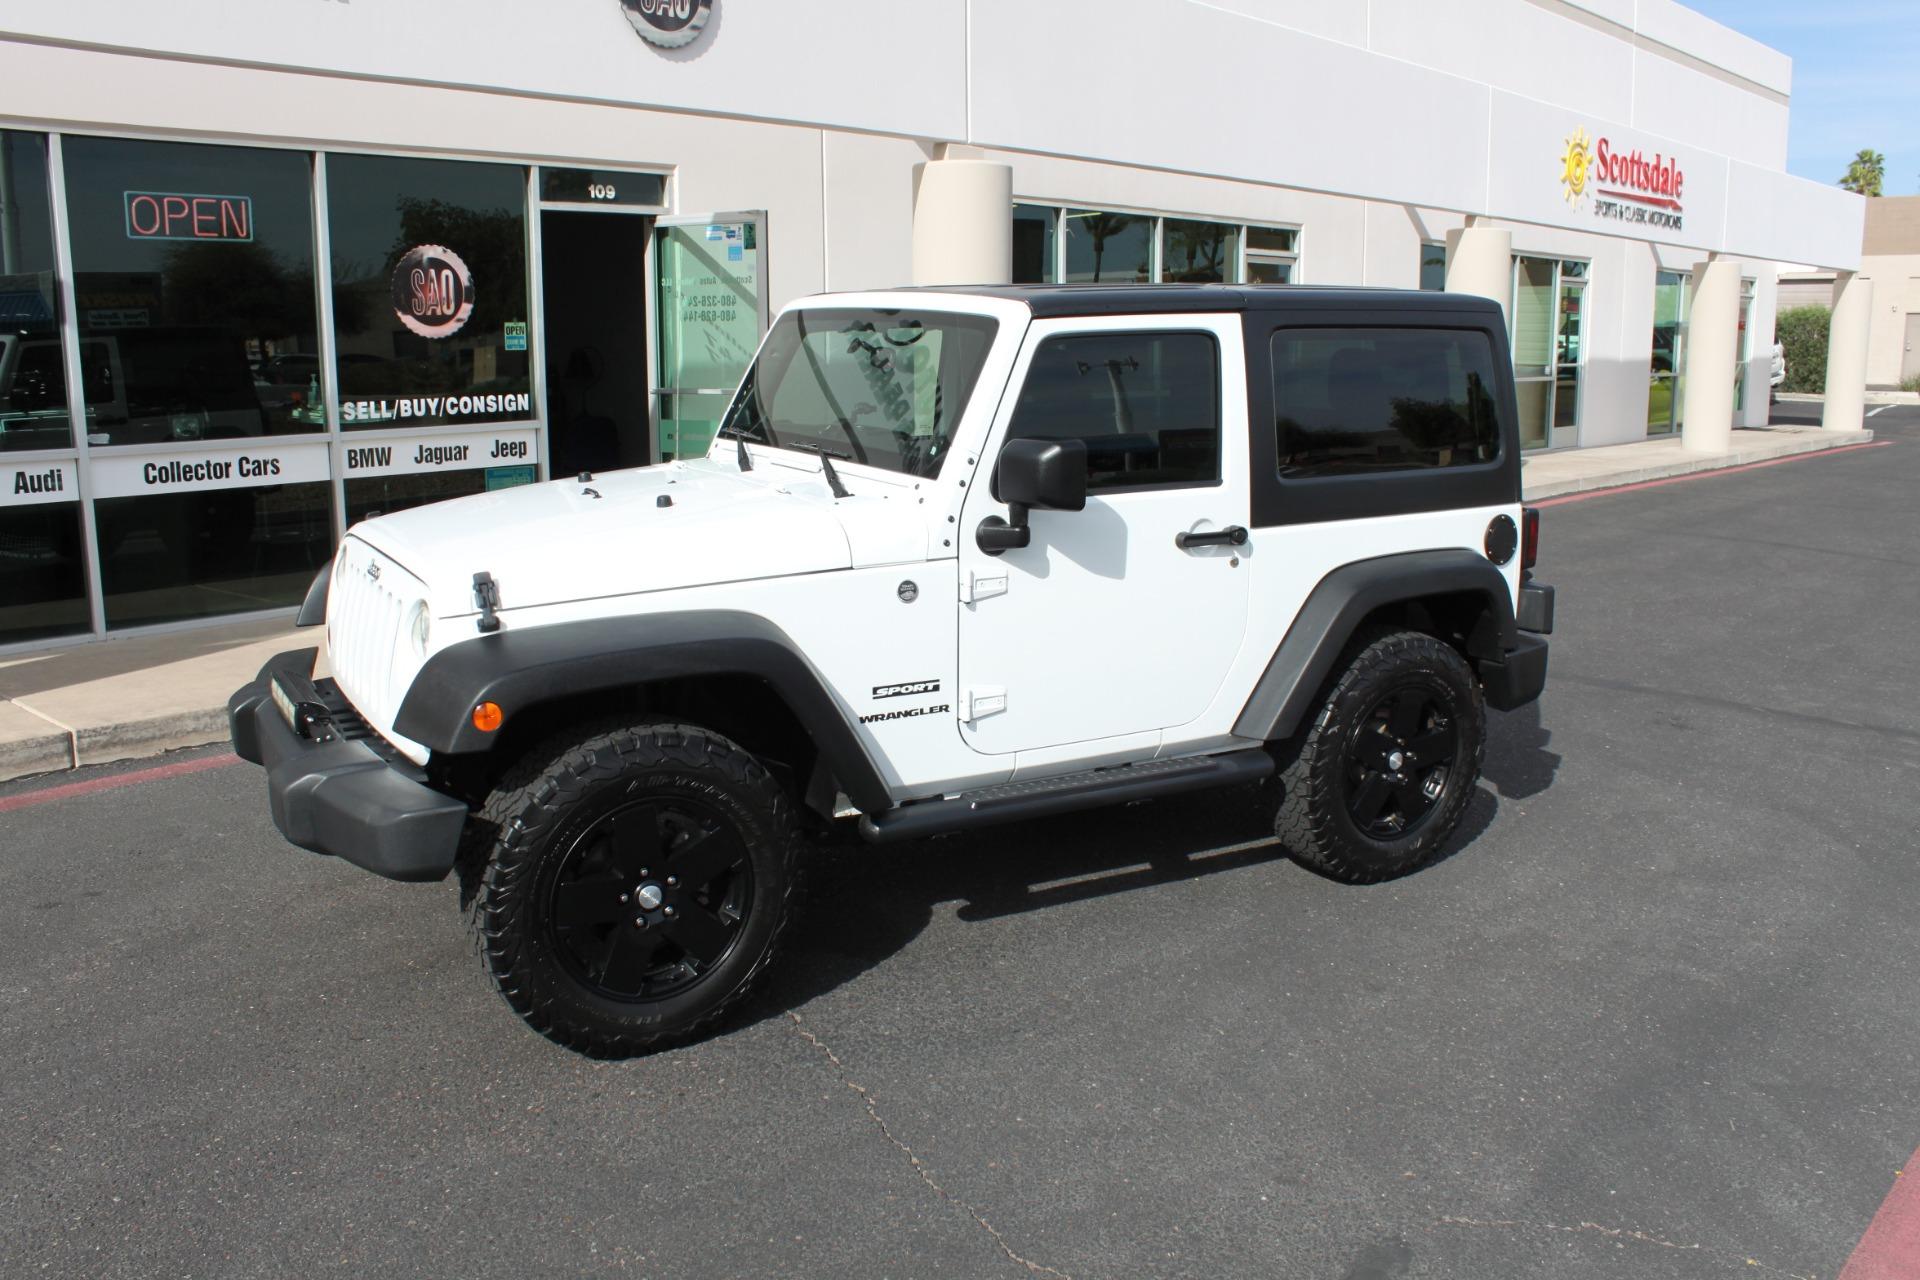 Used-2012-Jeep-Wrangler-Freedom-Edition-4X4-Acura